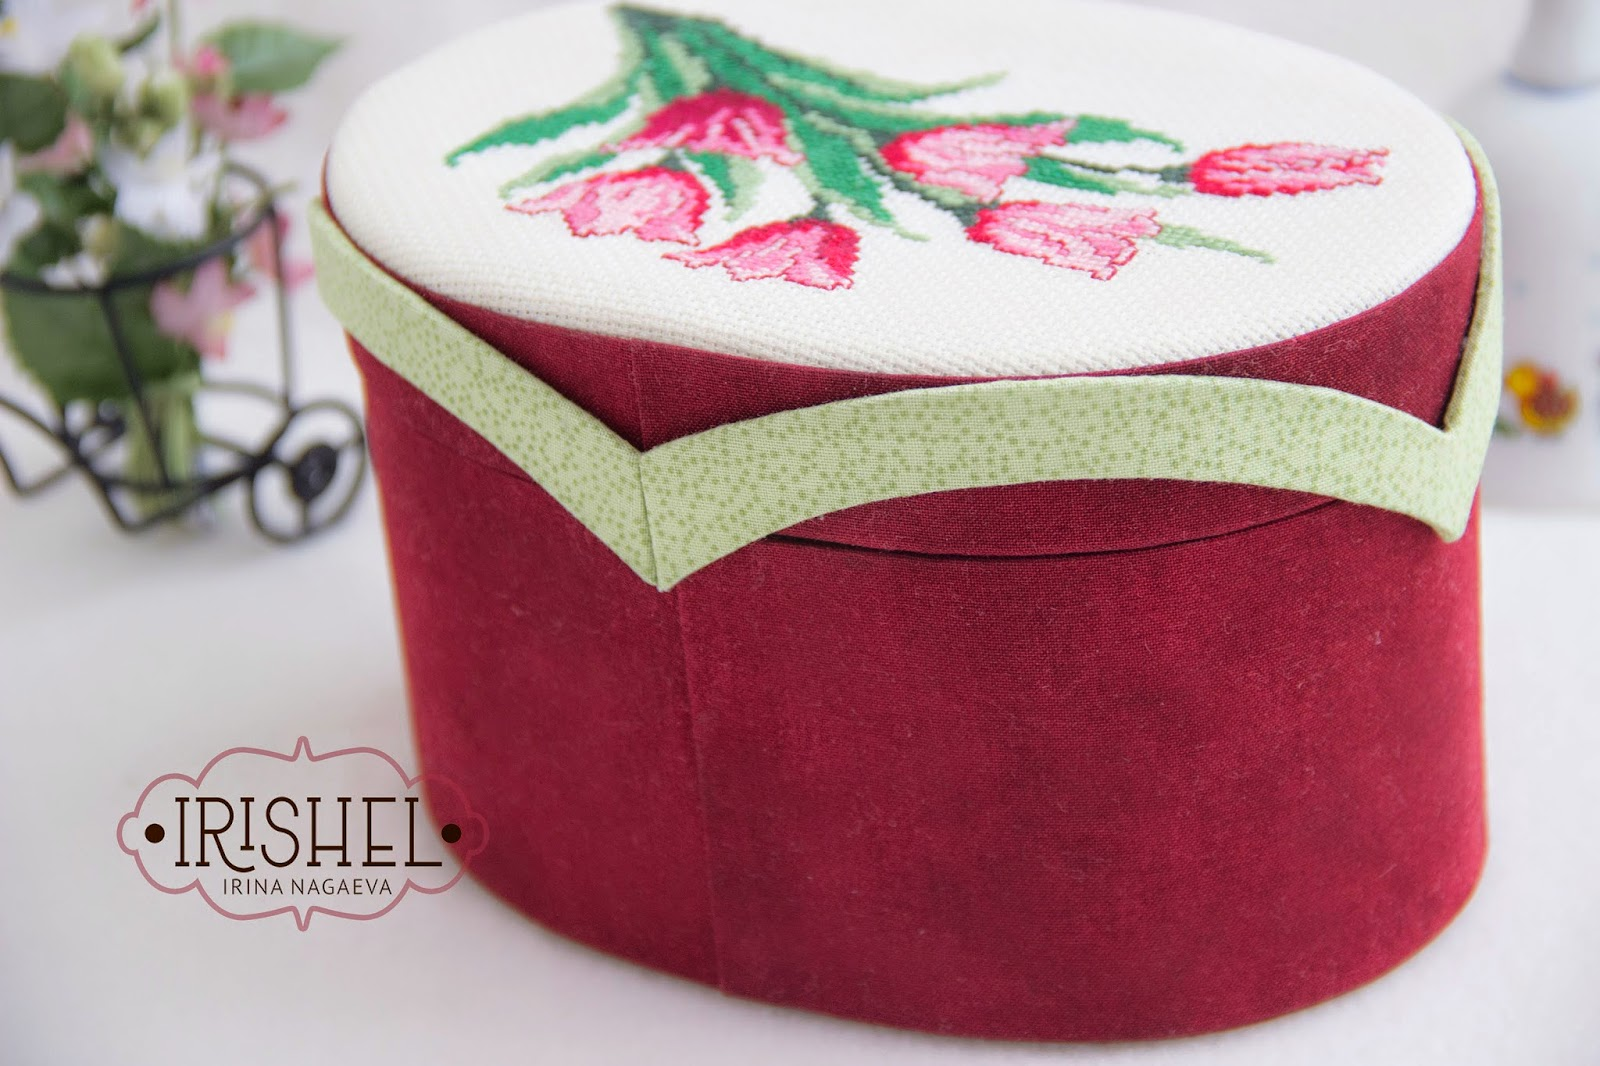 шкатулка, картонаж шкатулка с вышивкой картонажная шкатулка овальная шкатулка шкатулка в подарок